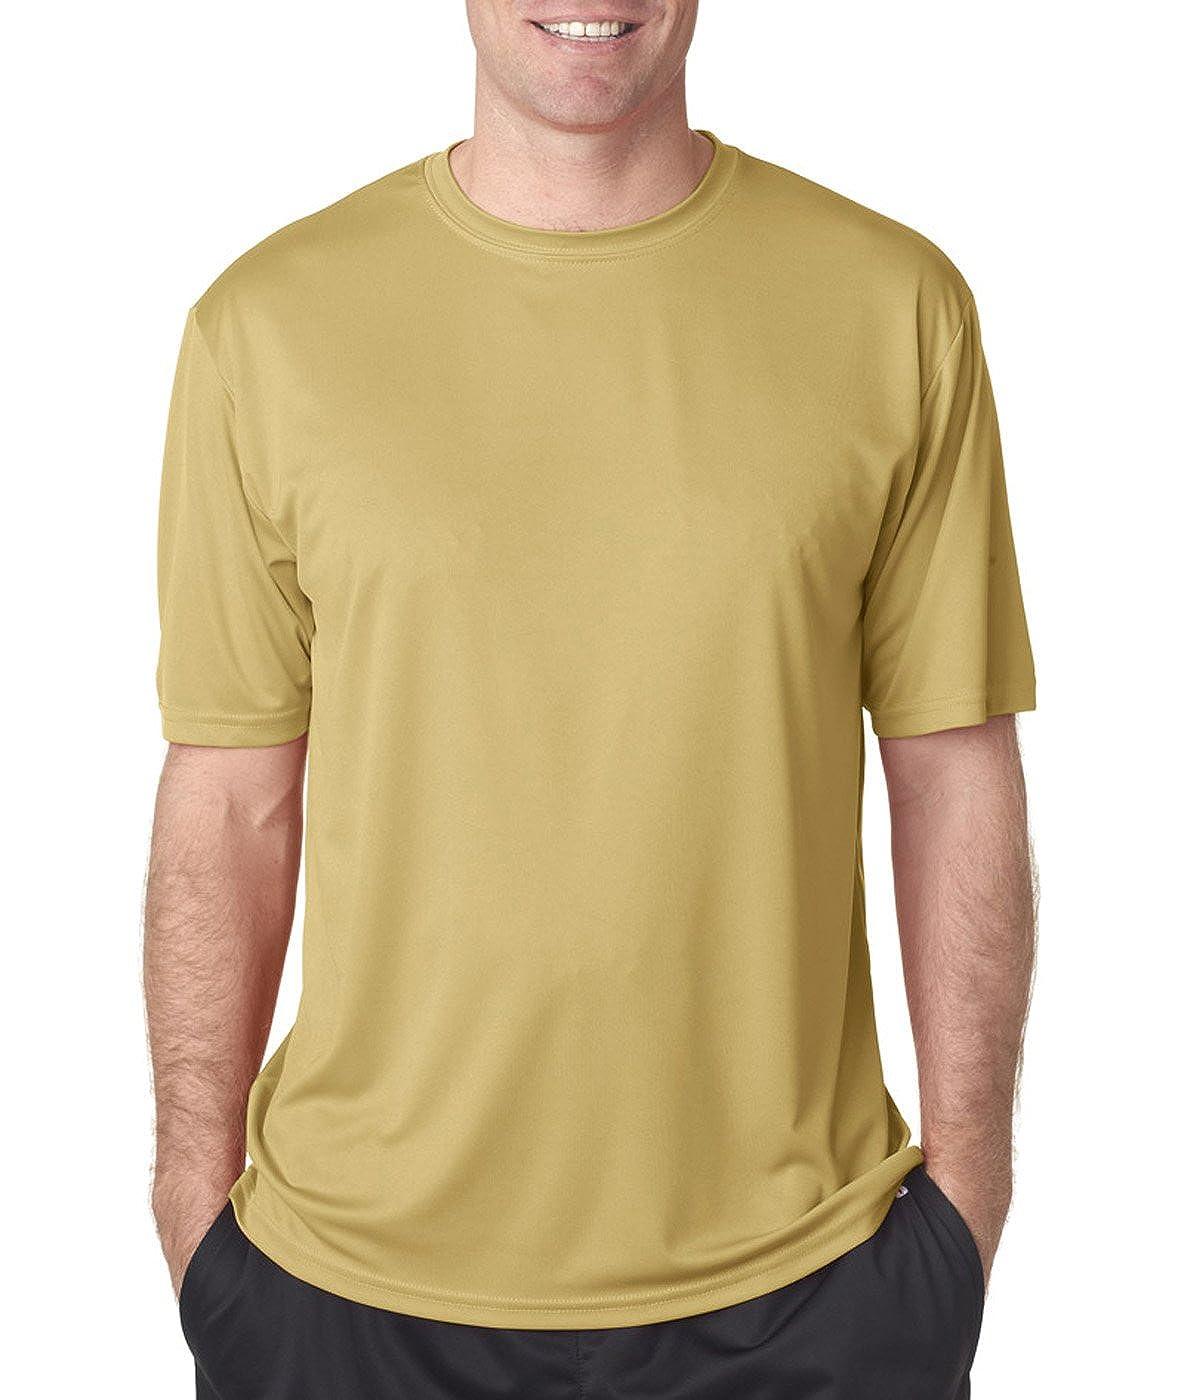 355f0aea7b2 A4 Mens Performance Colorblock T Shirts - Nils Stucki Kieferorthopäde